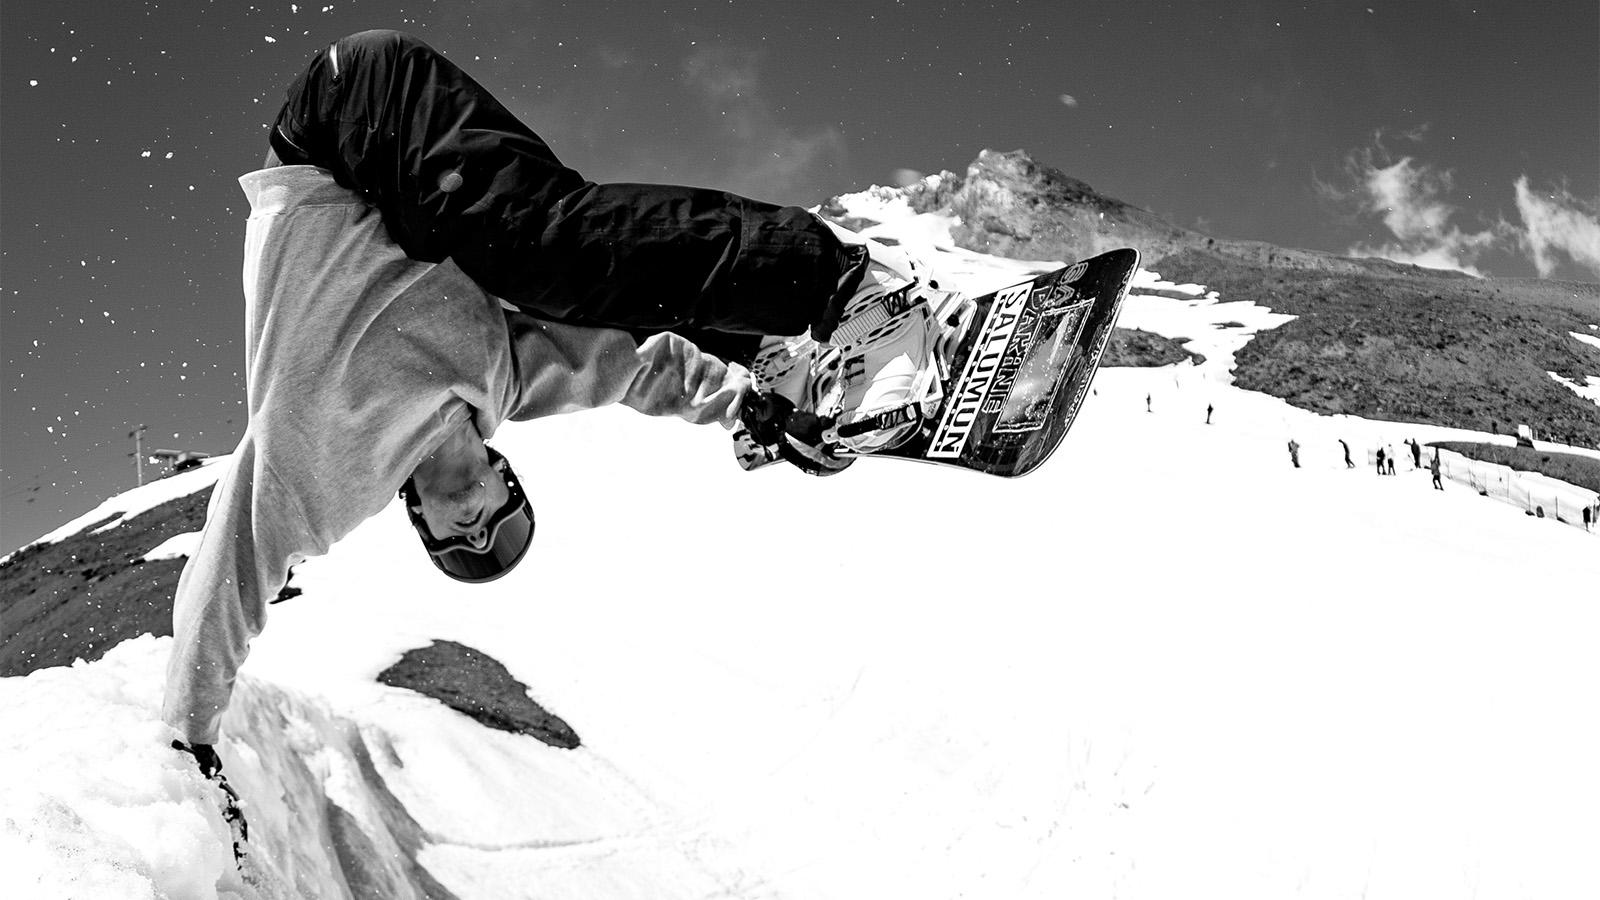 Salomon FW20/21 Snowboard Bindings